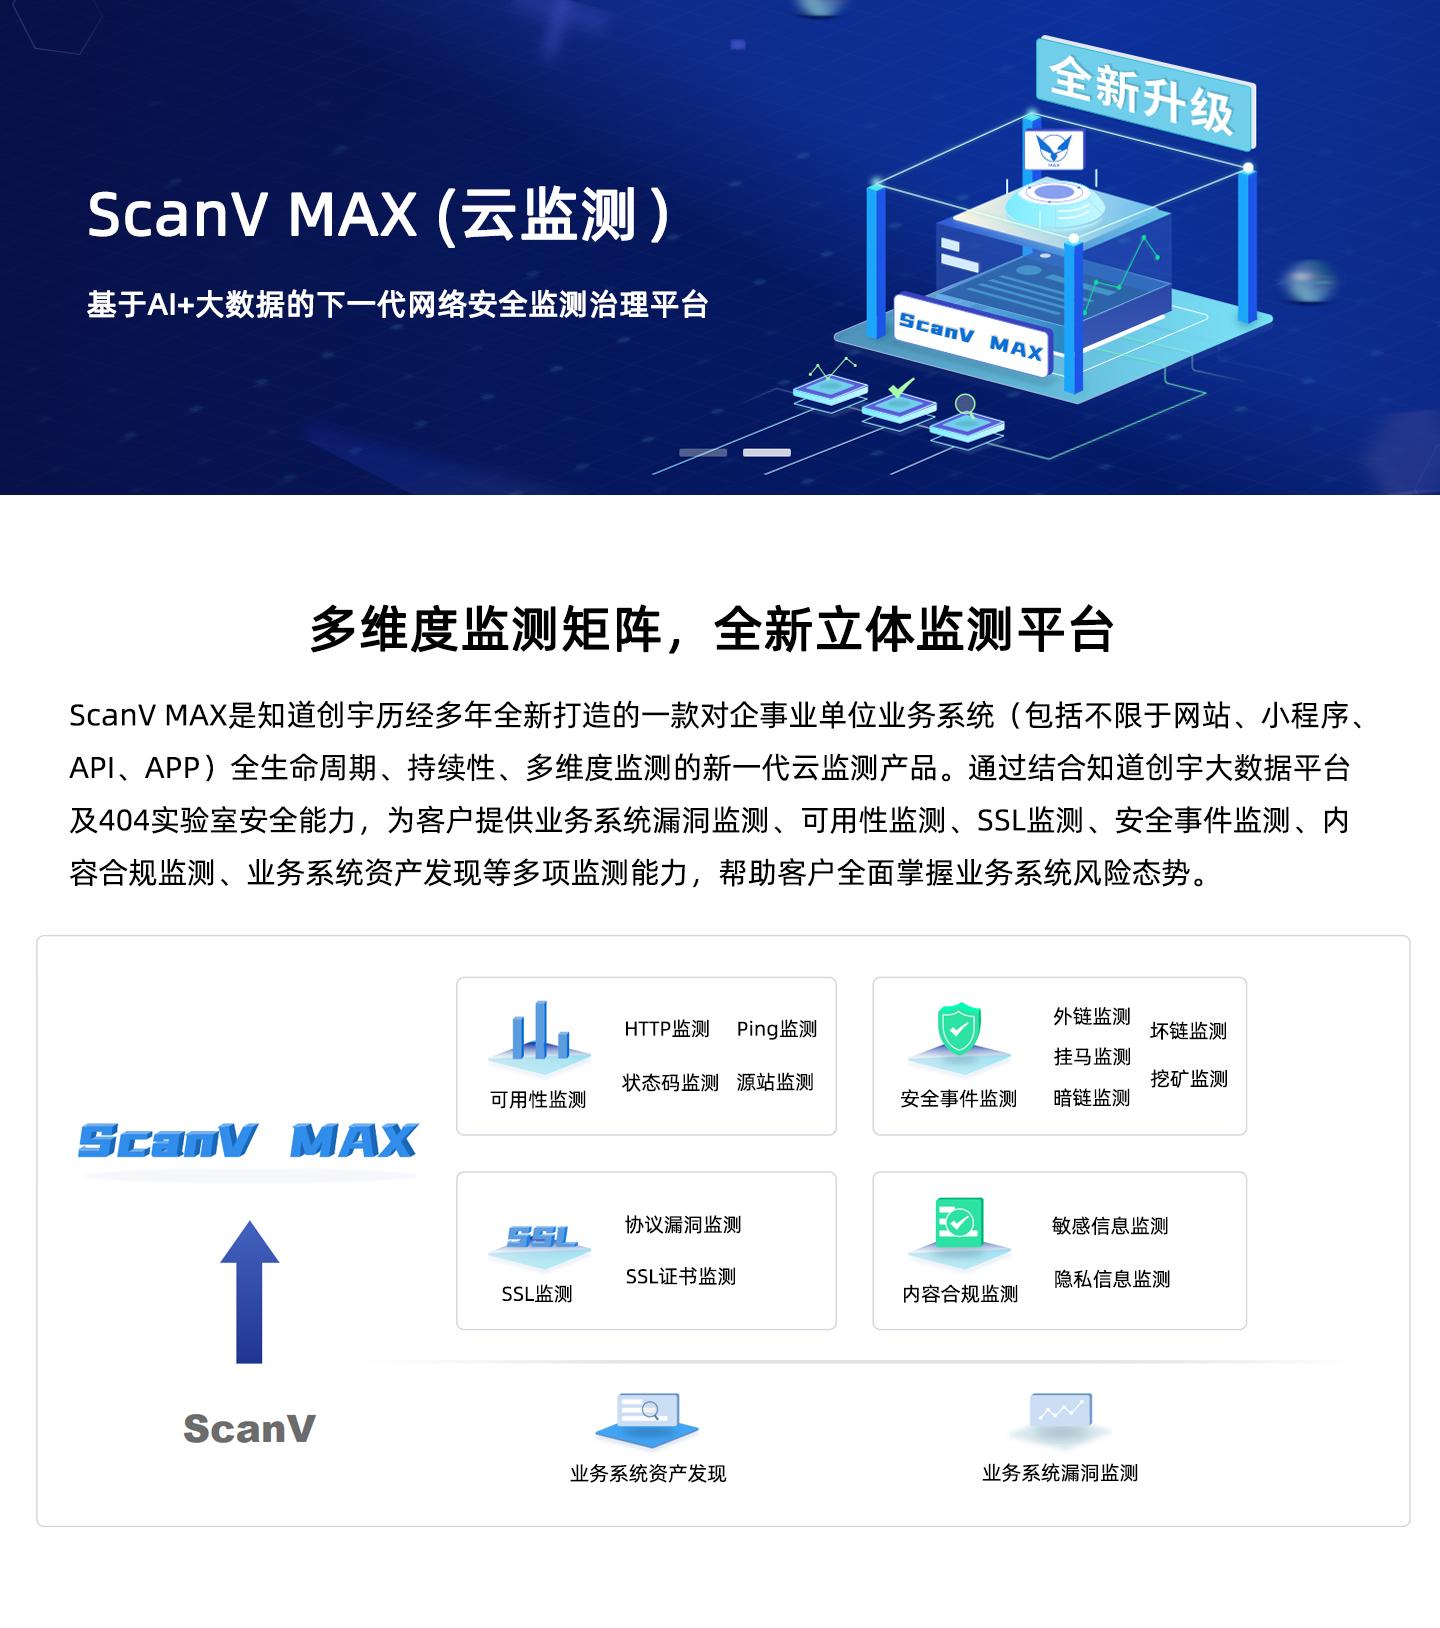 ScanV-MAX-(云监测)1440_01.jpg